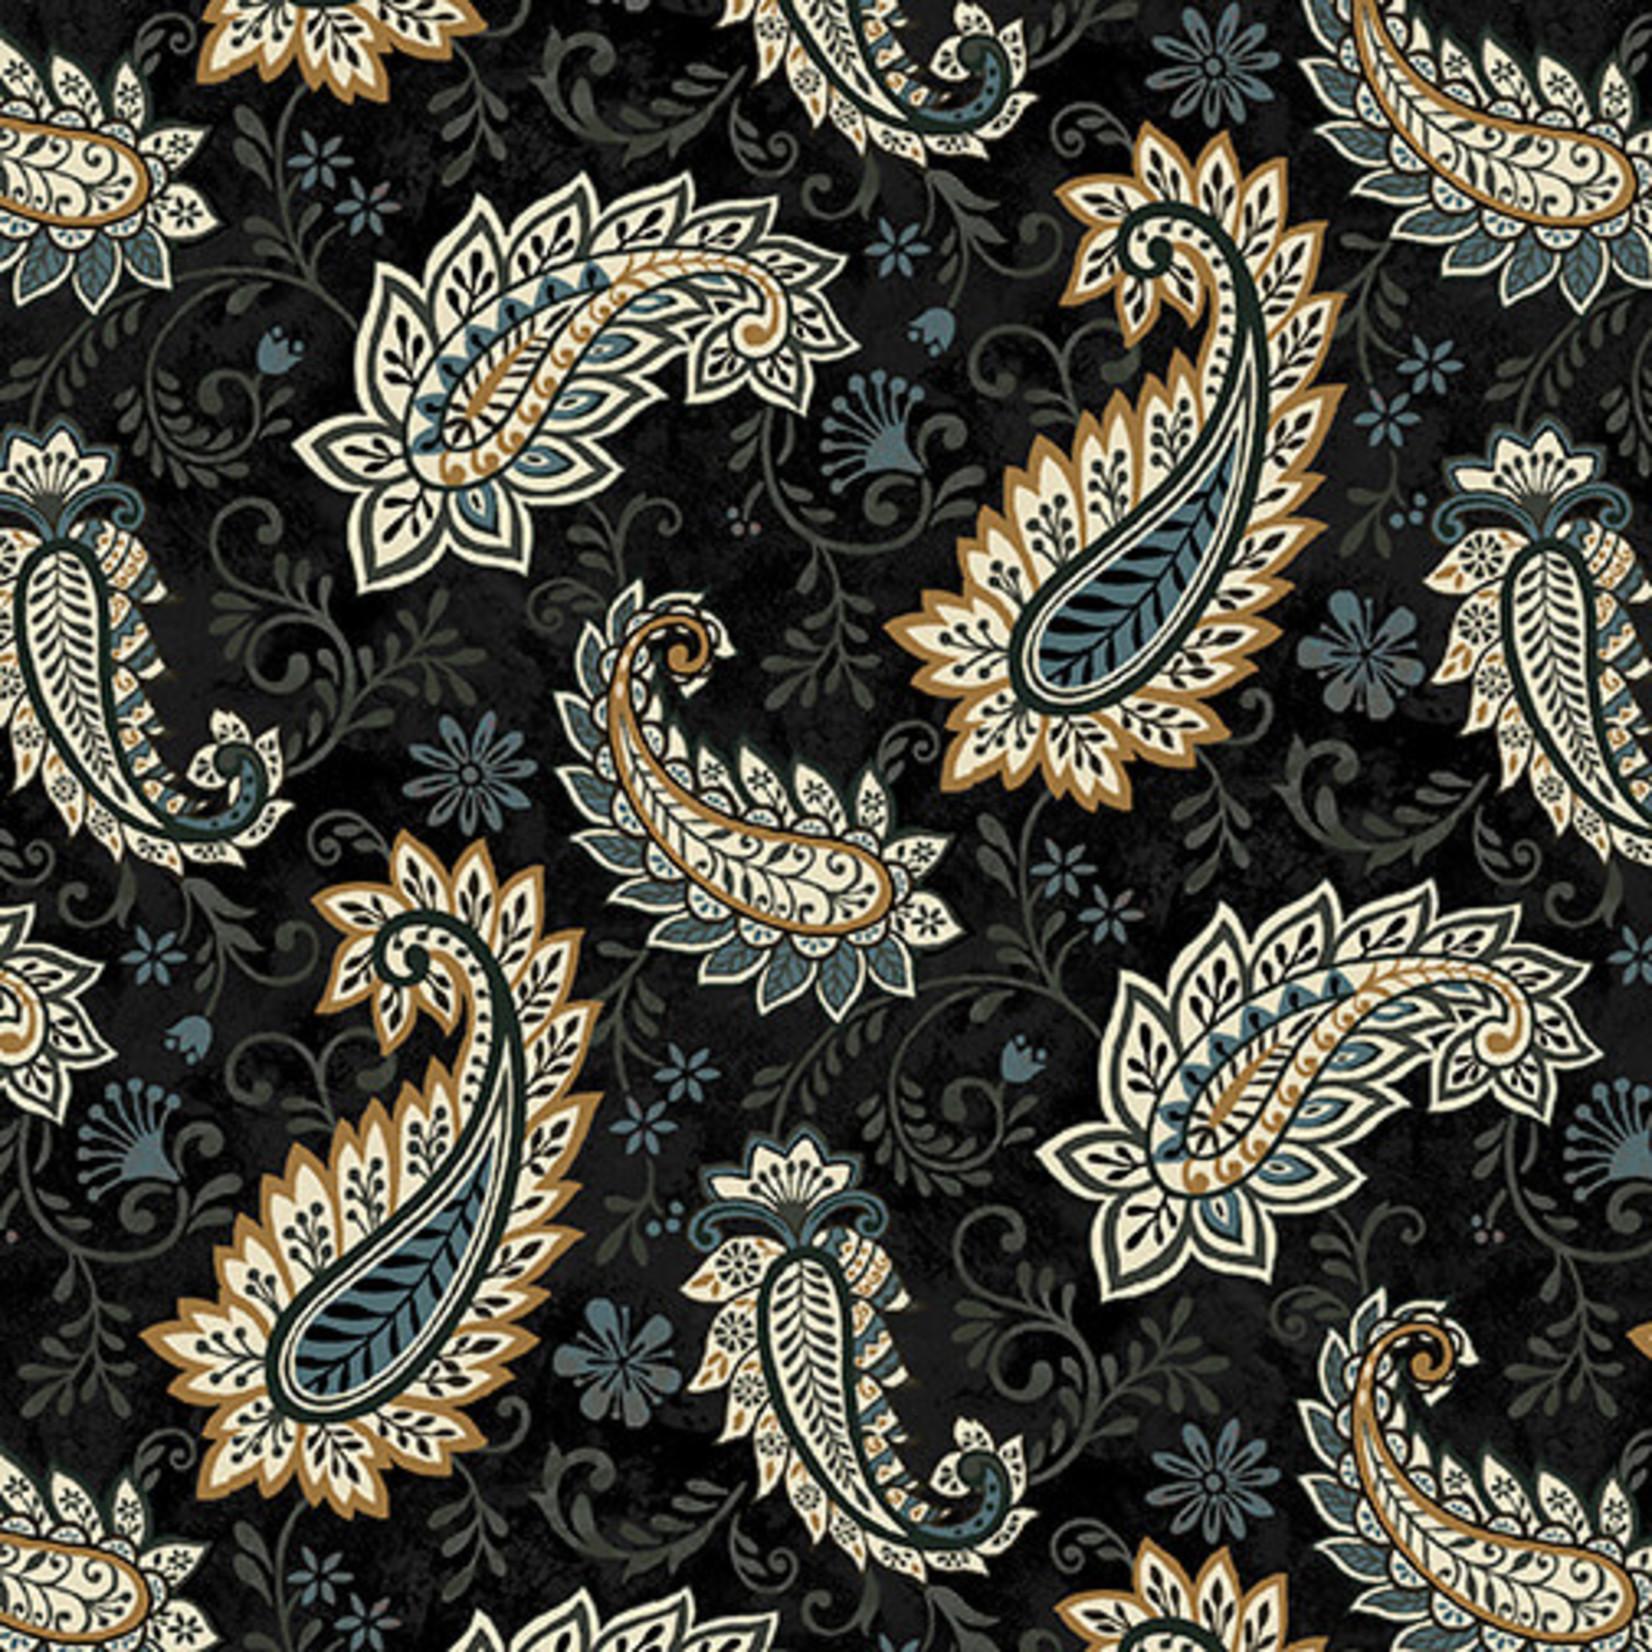 Studio E Fabrics Le Poulet - Paisley - Black